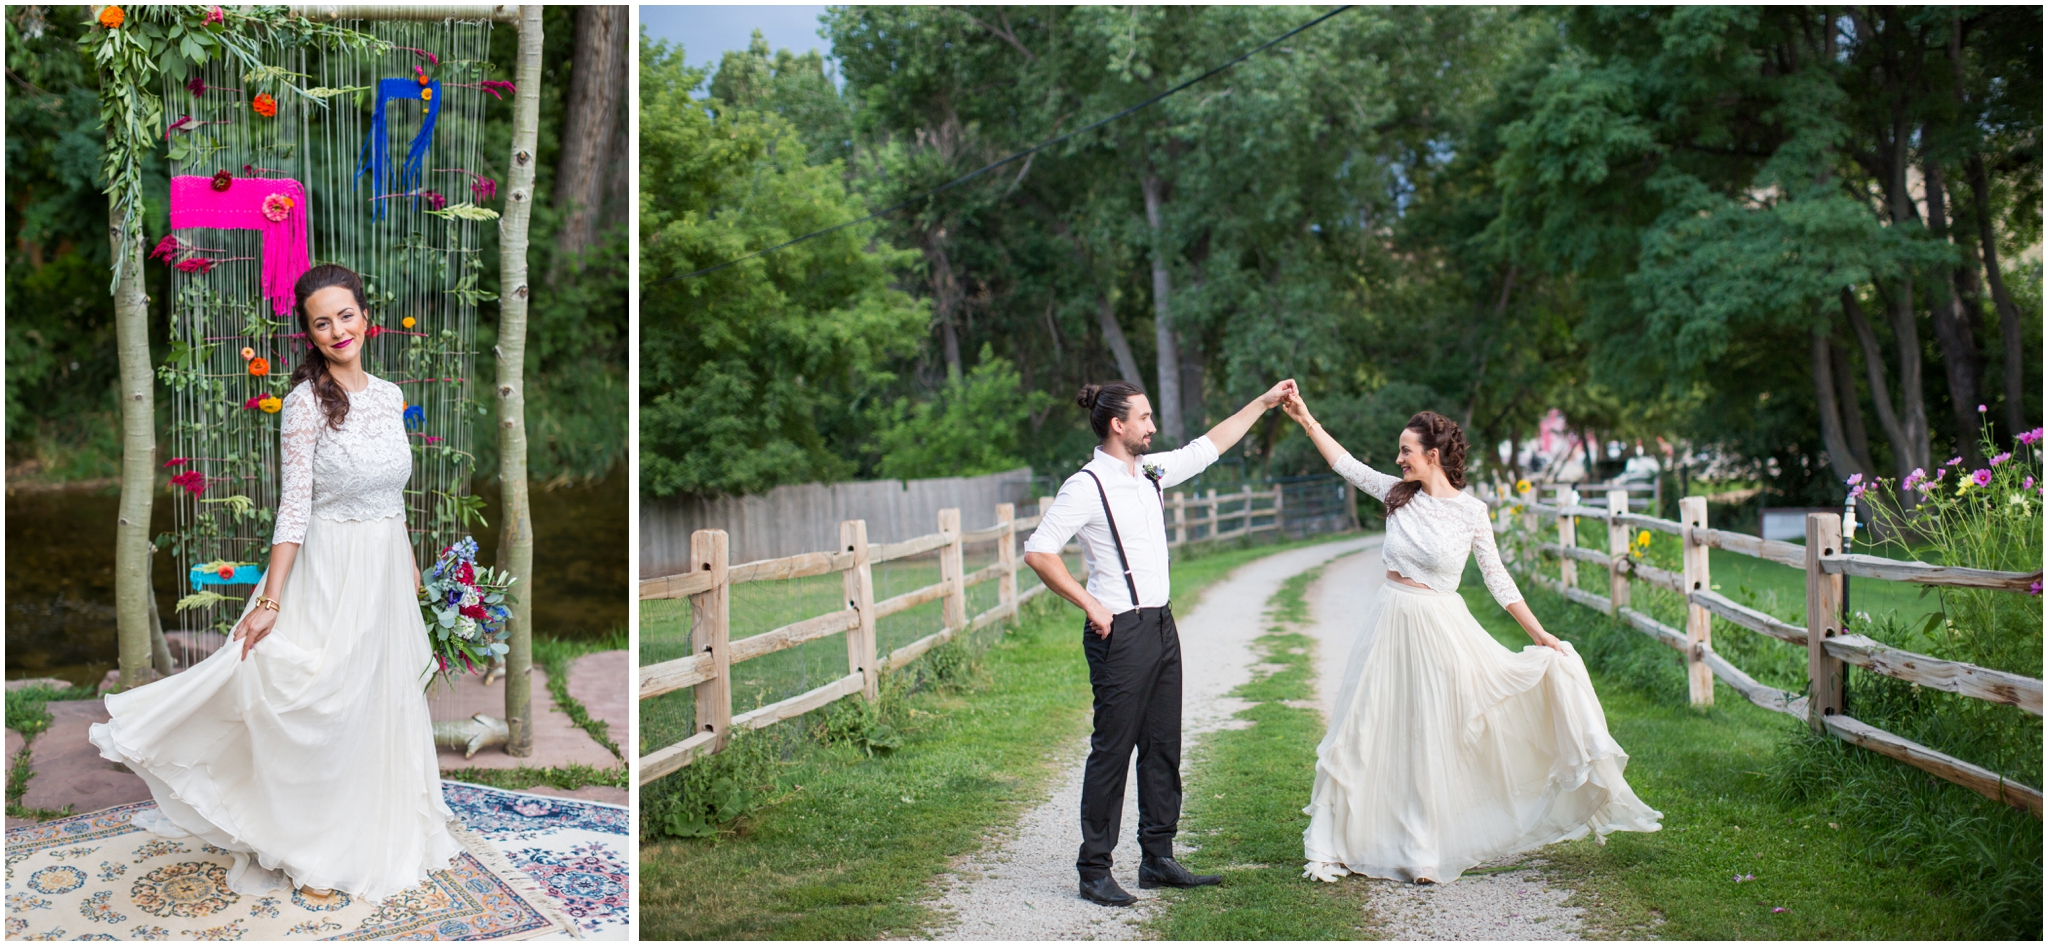 Lyons Wedding Photographer.JPG